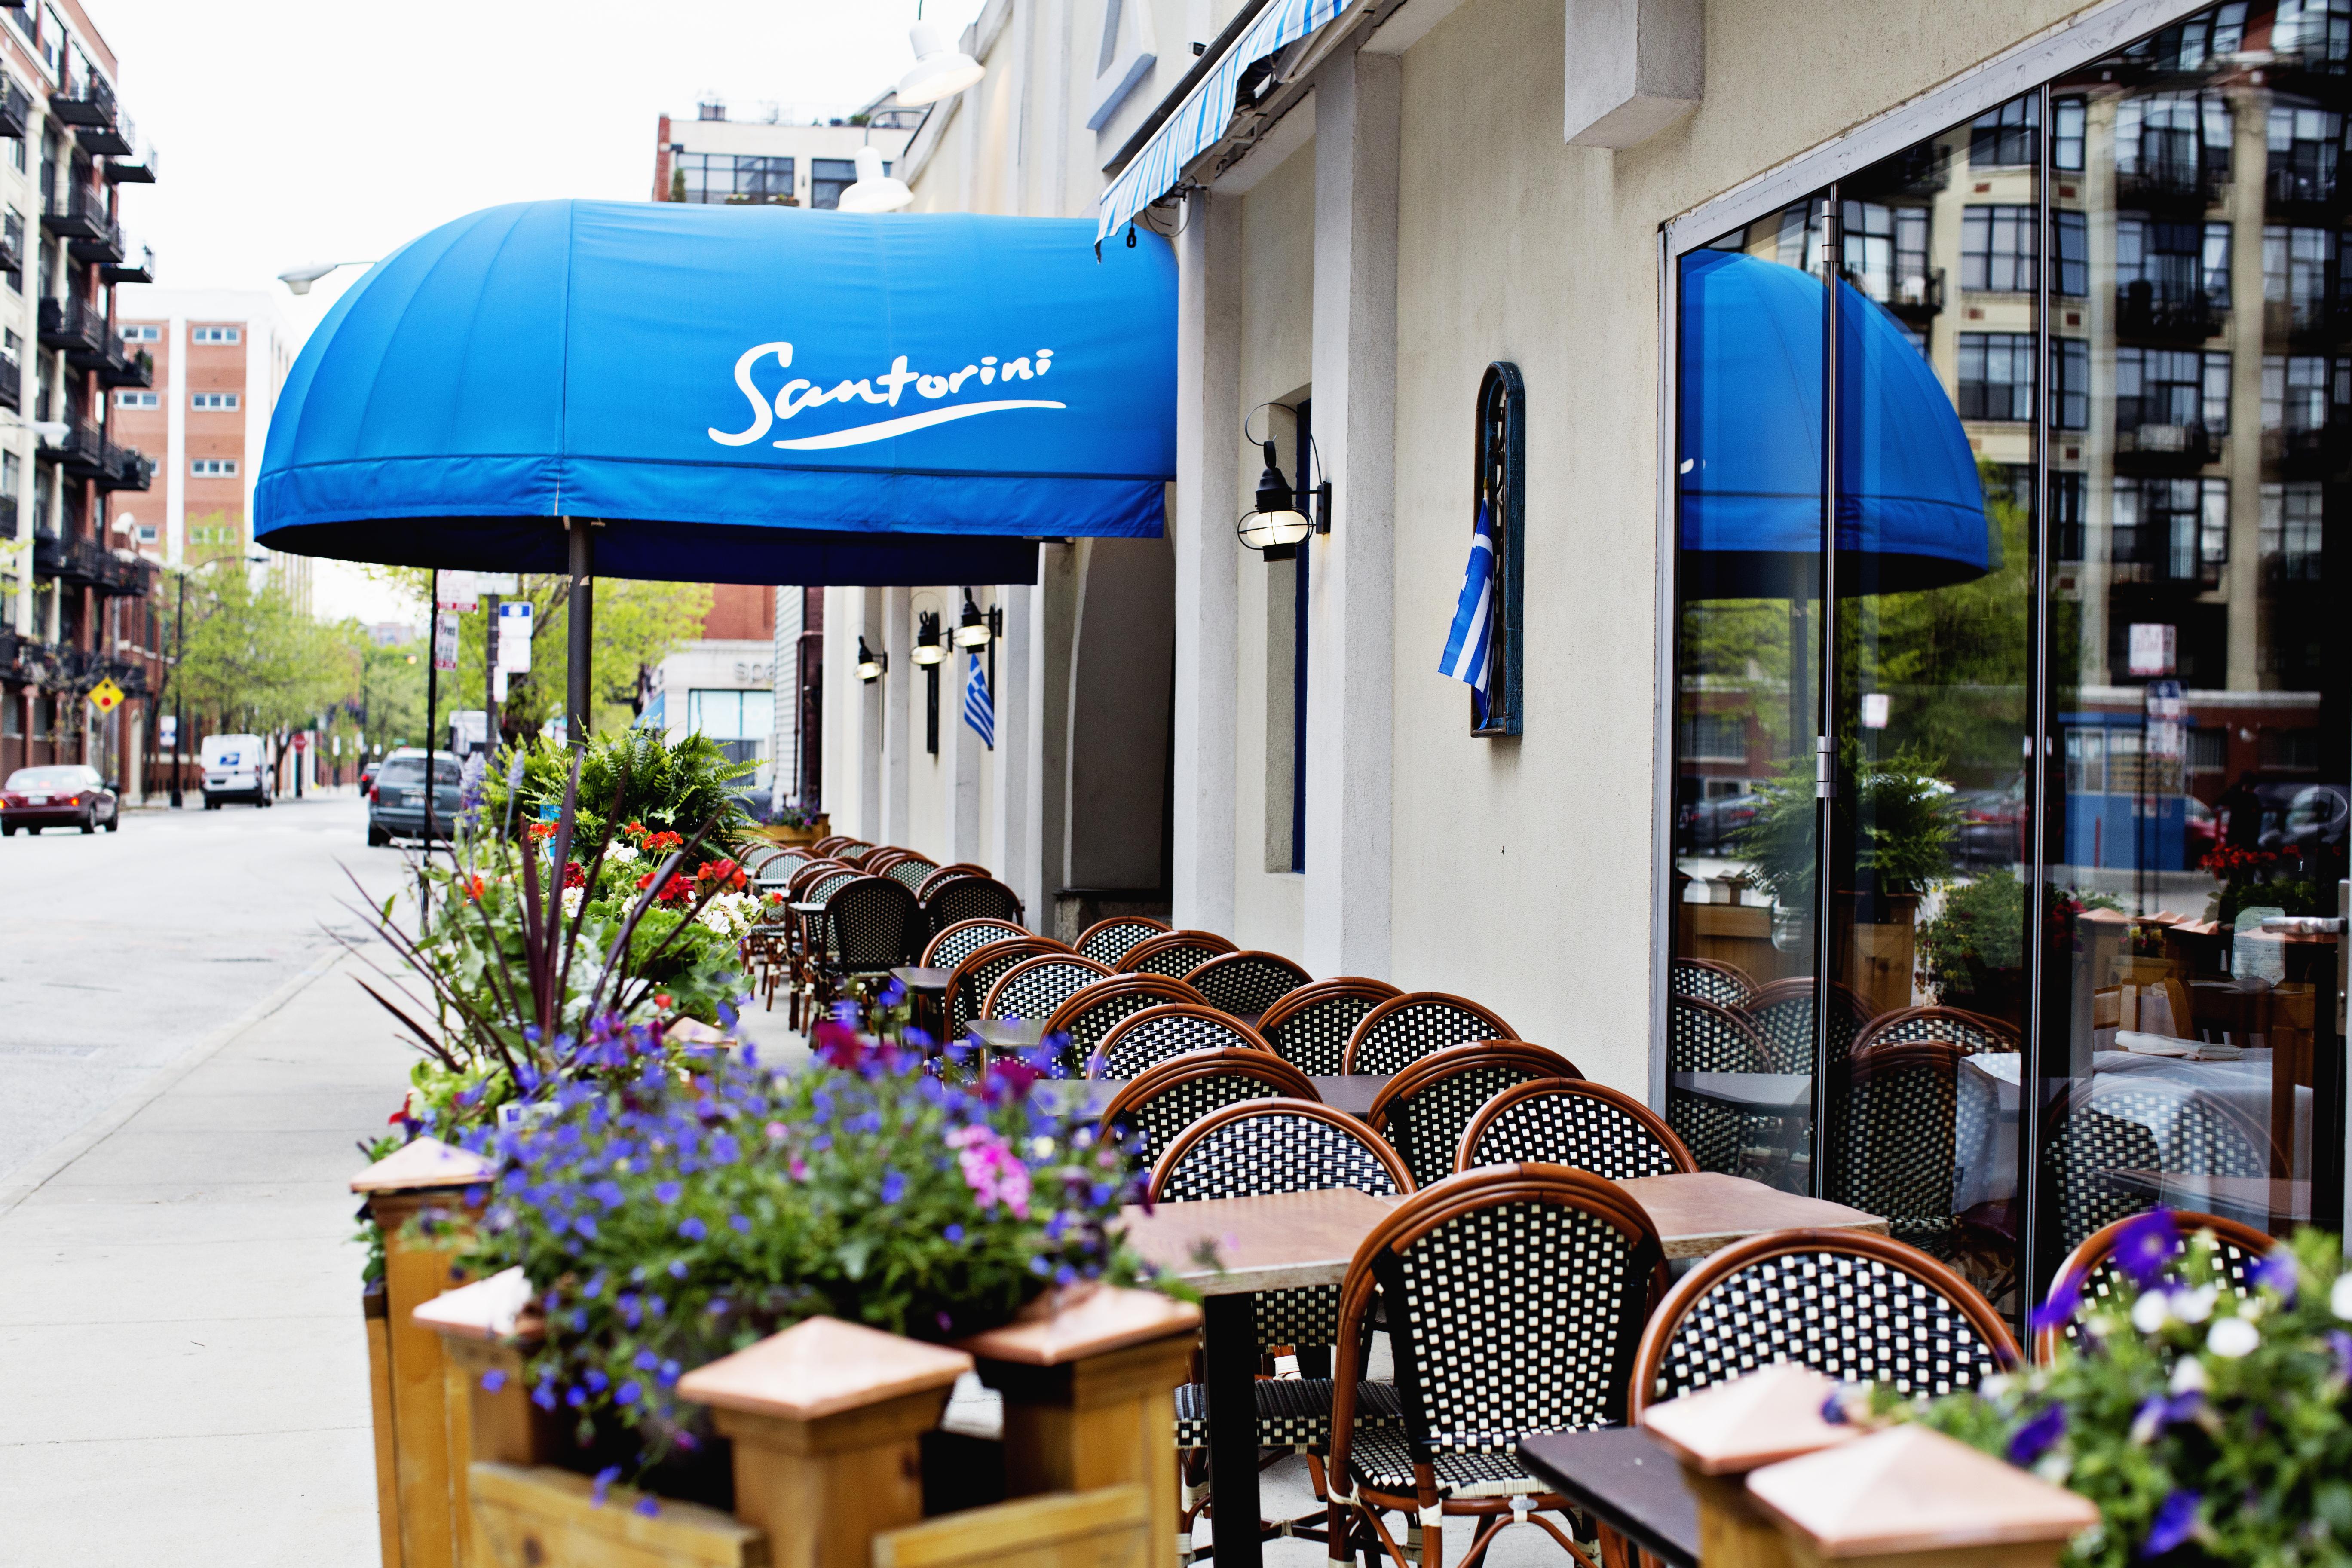 A restaurant's blue awning behind its sidewalk patio.